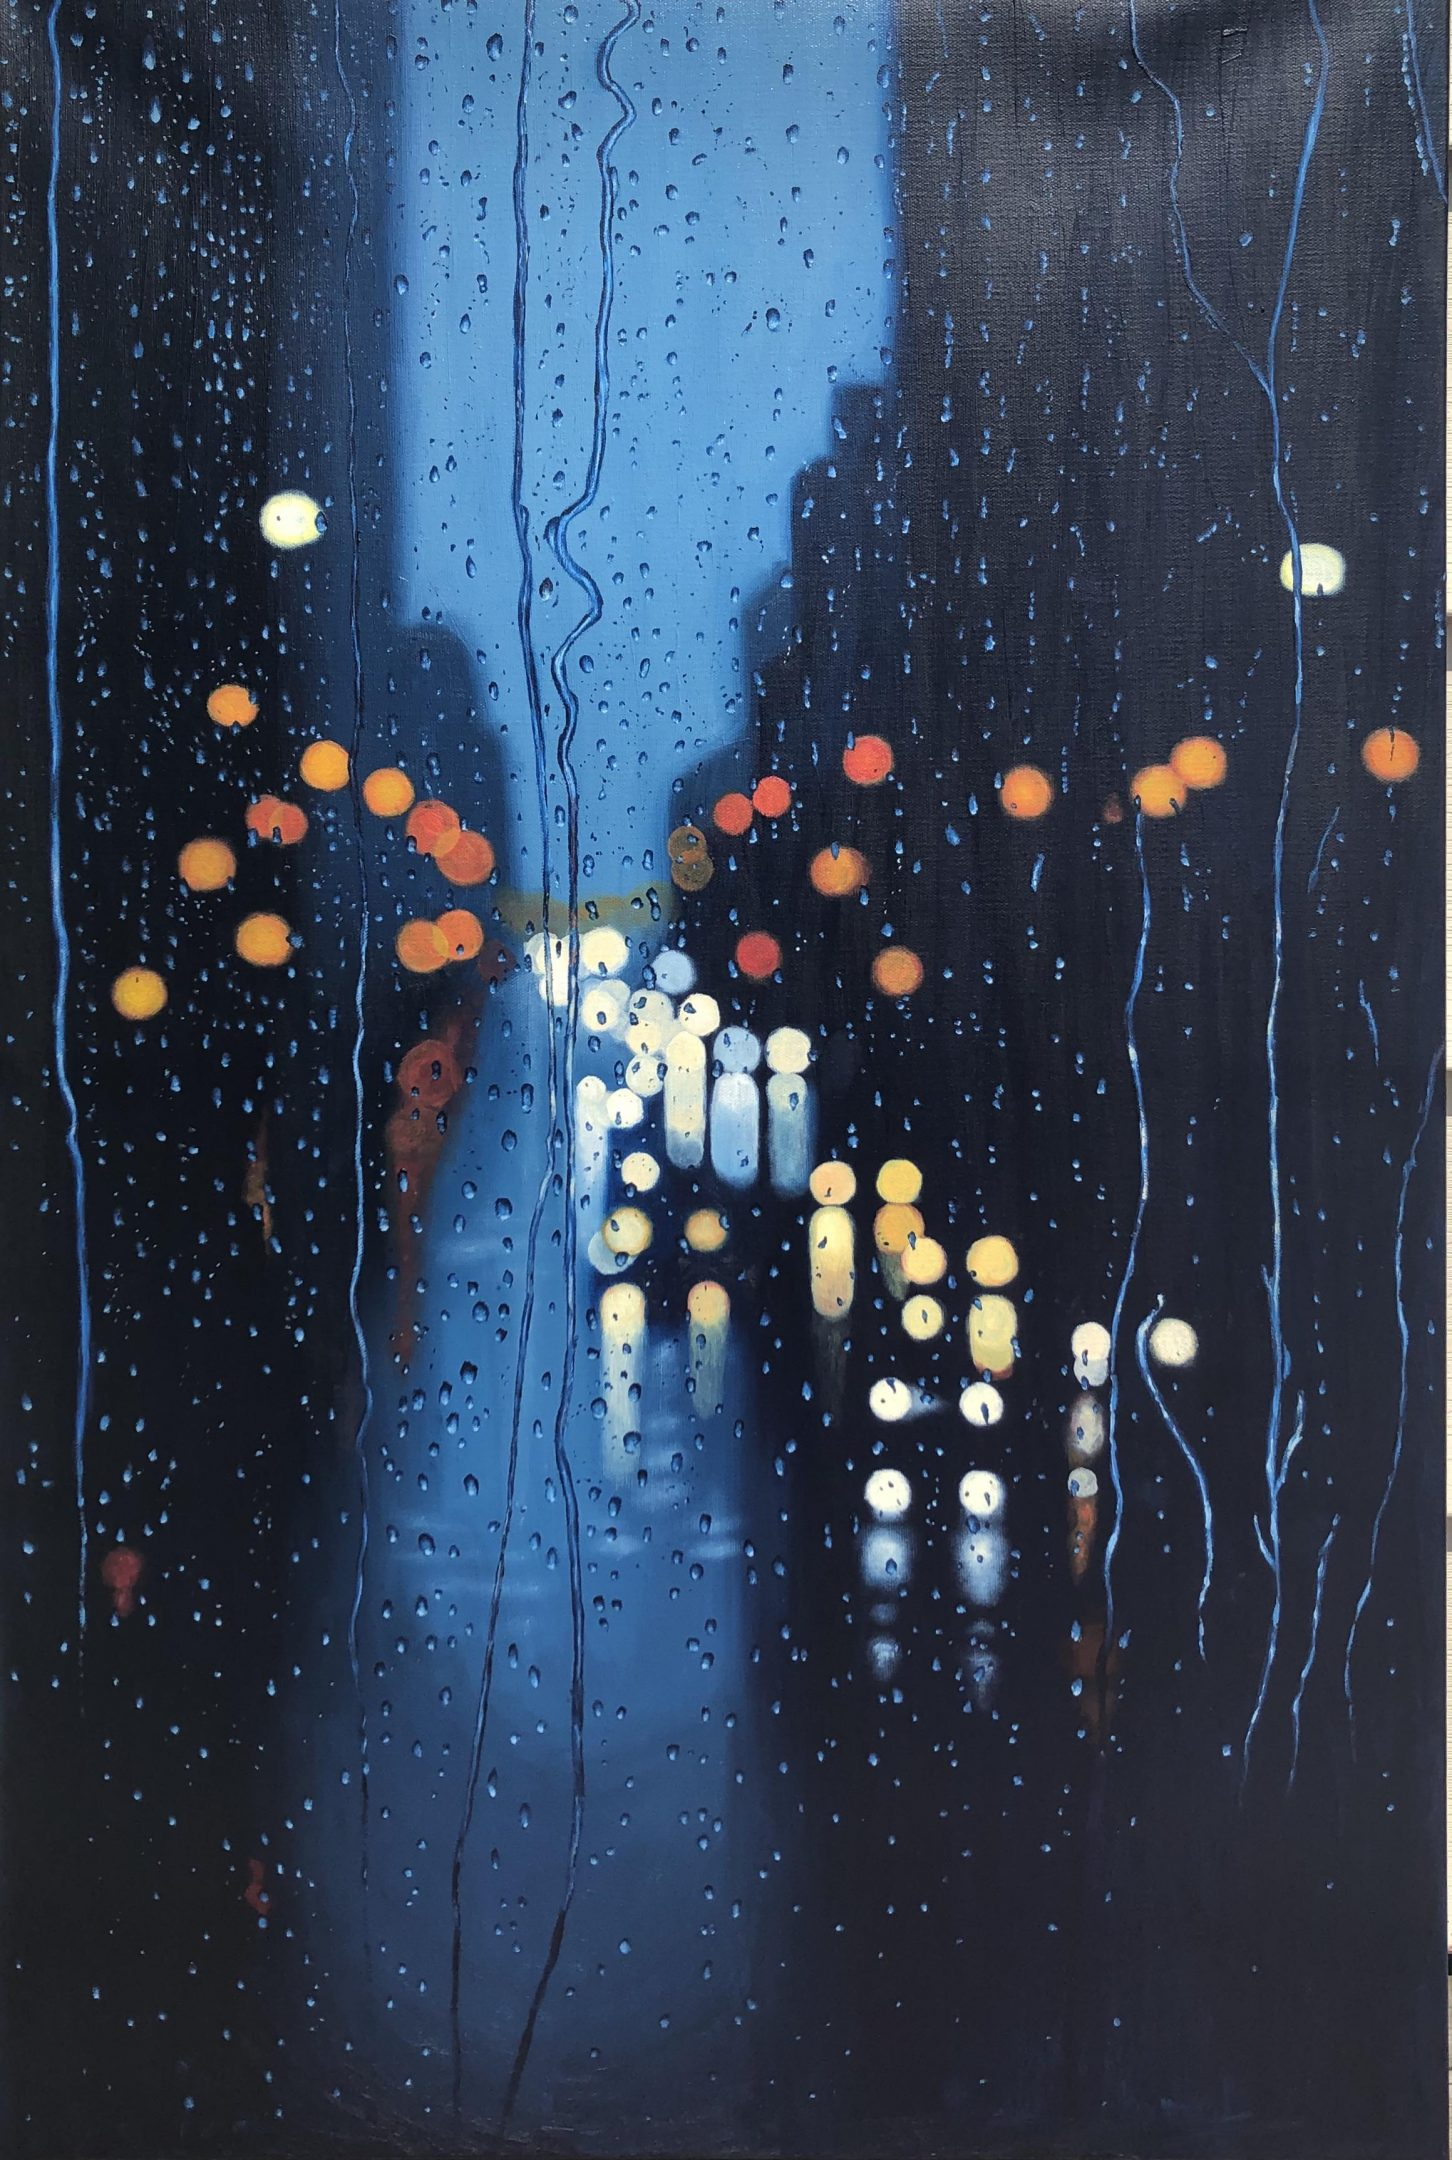 Rainy day: Oil paint